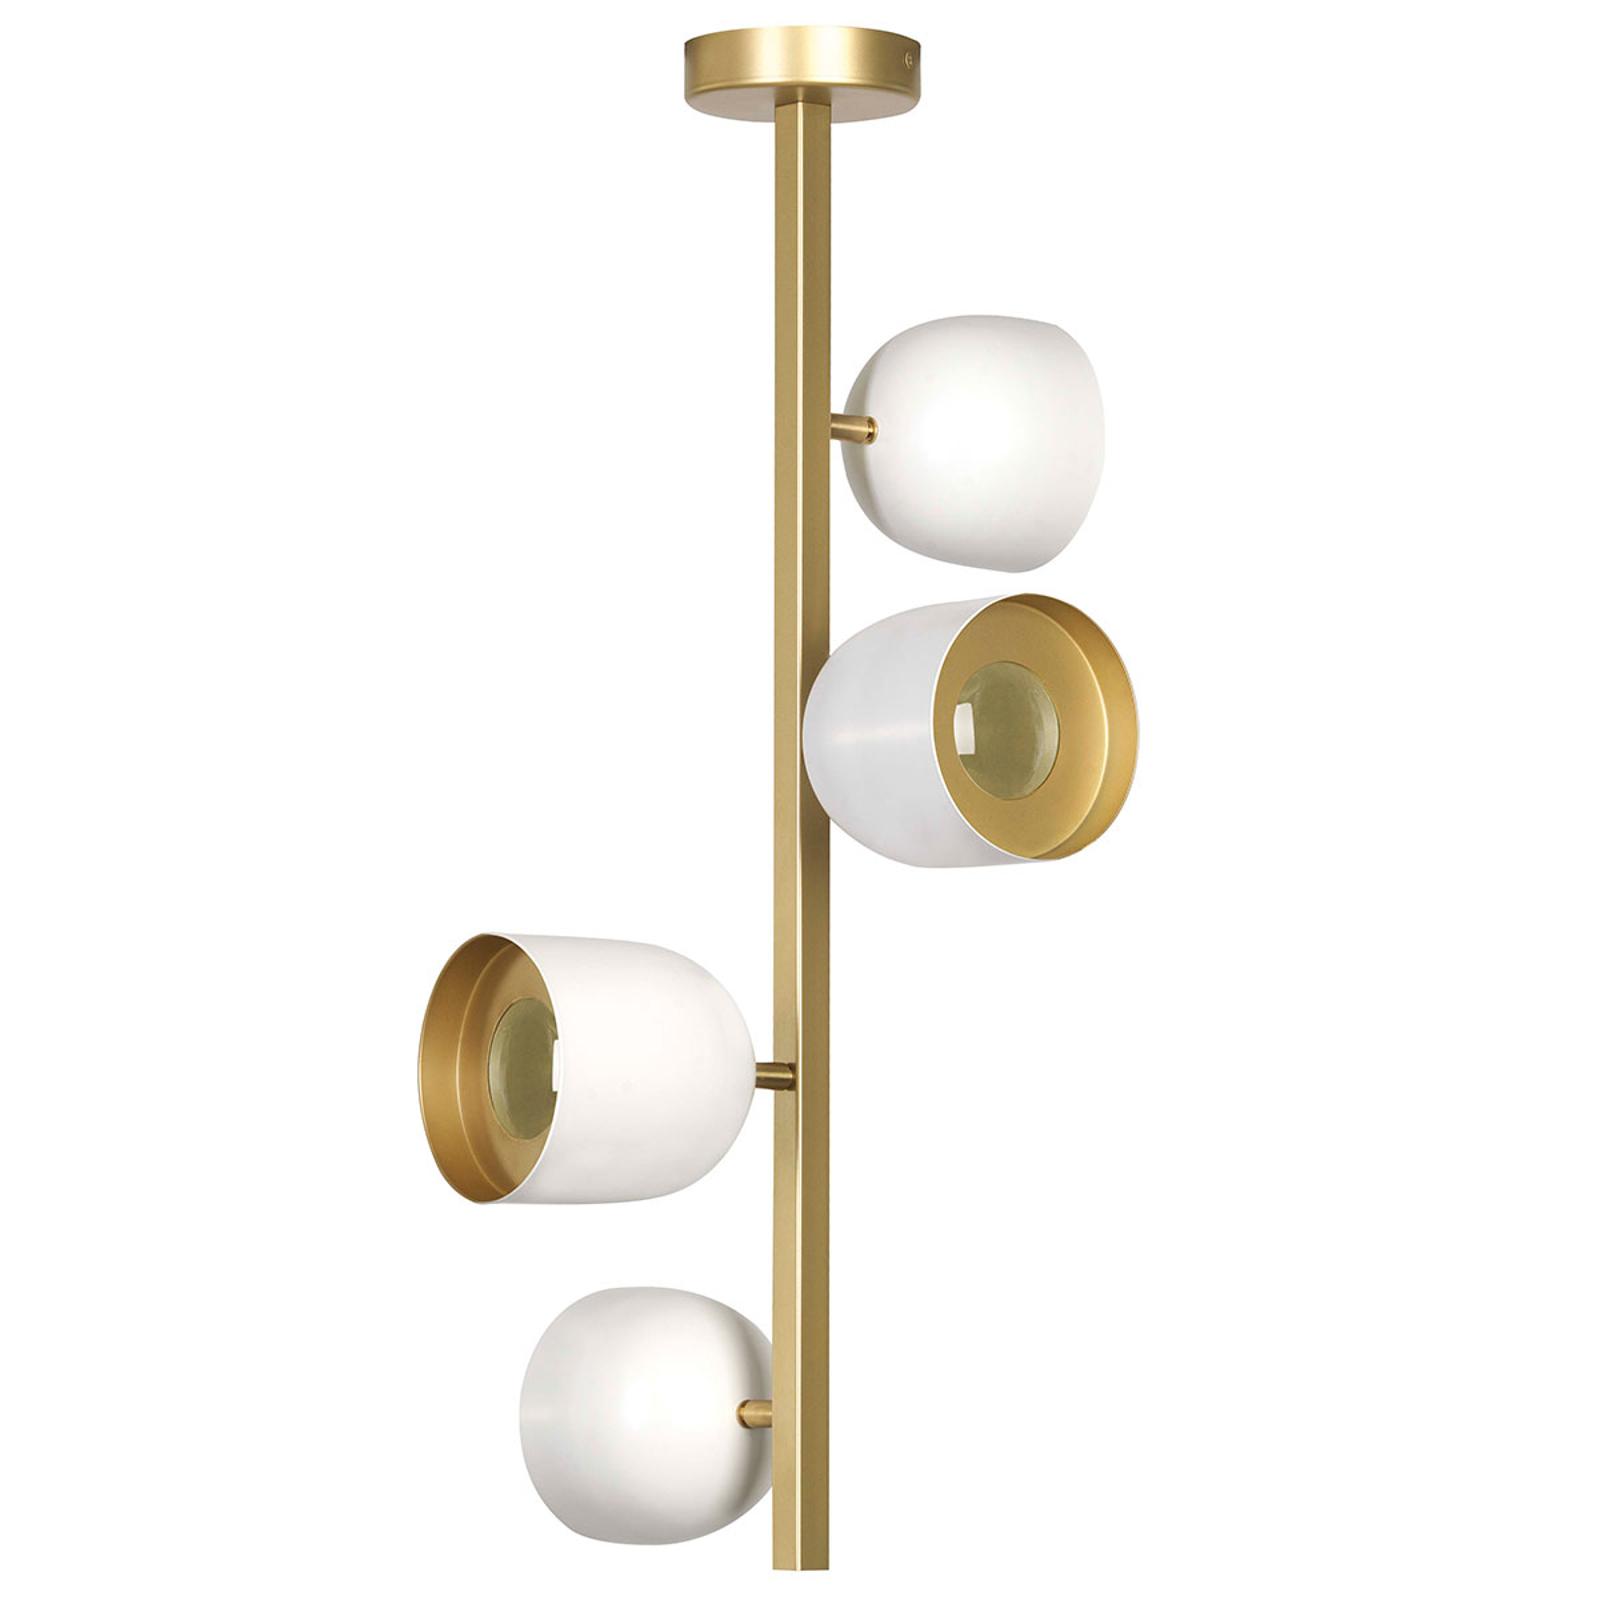 Dome LED-taklampe 4 lyskilder 73 cm hvit